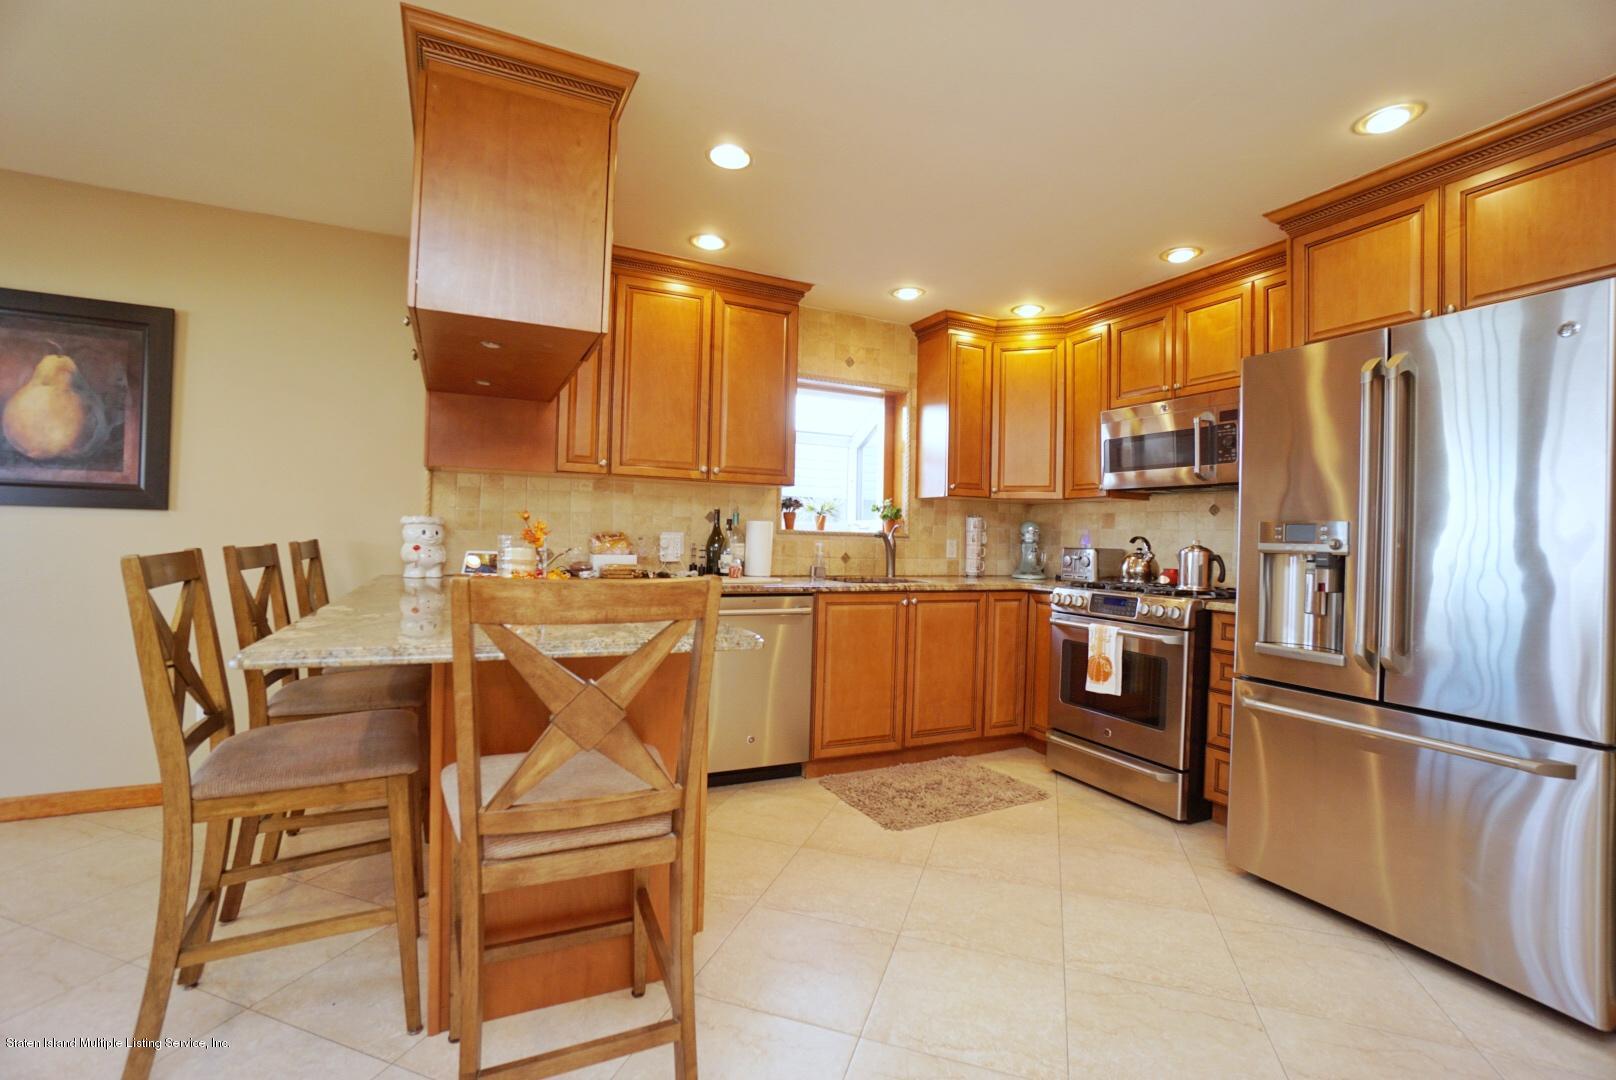 Single Family - Semi-Attached 47 Ilyse Court   Staten Island, NY 10306, MLS-1141335-9